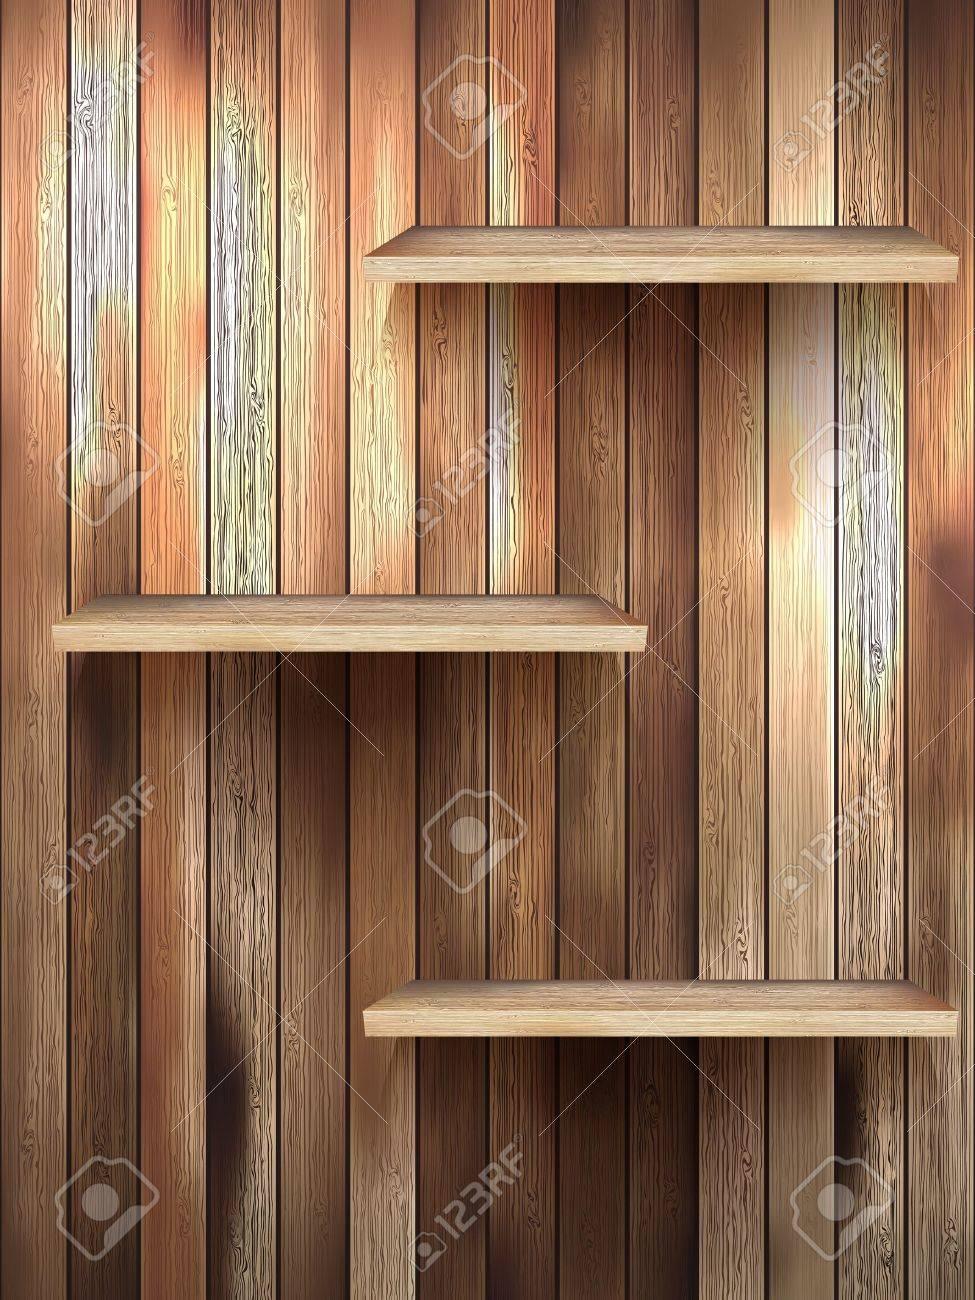 Full Size of Regal Holz Isoliert 3d Leere Fr Ausstellung Lizenzfrei Nutzbare Werkstatt Aus Kisten Offenes Holzofen Küche Dachschräge Kolonialstil Regale Europaletten Cd Regal Regal Holz